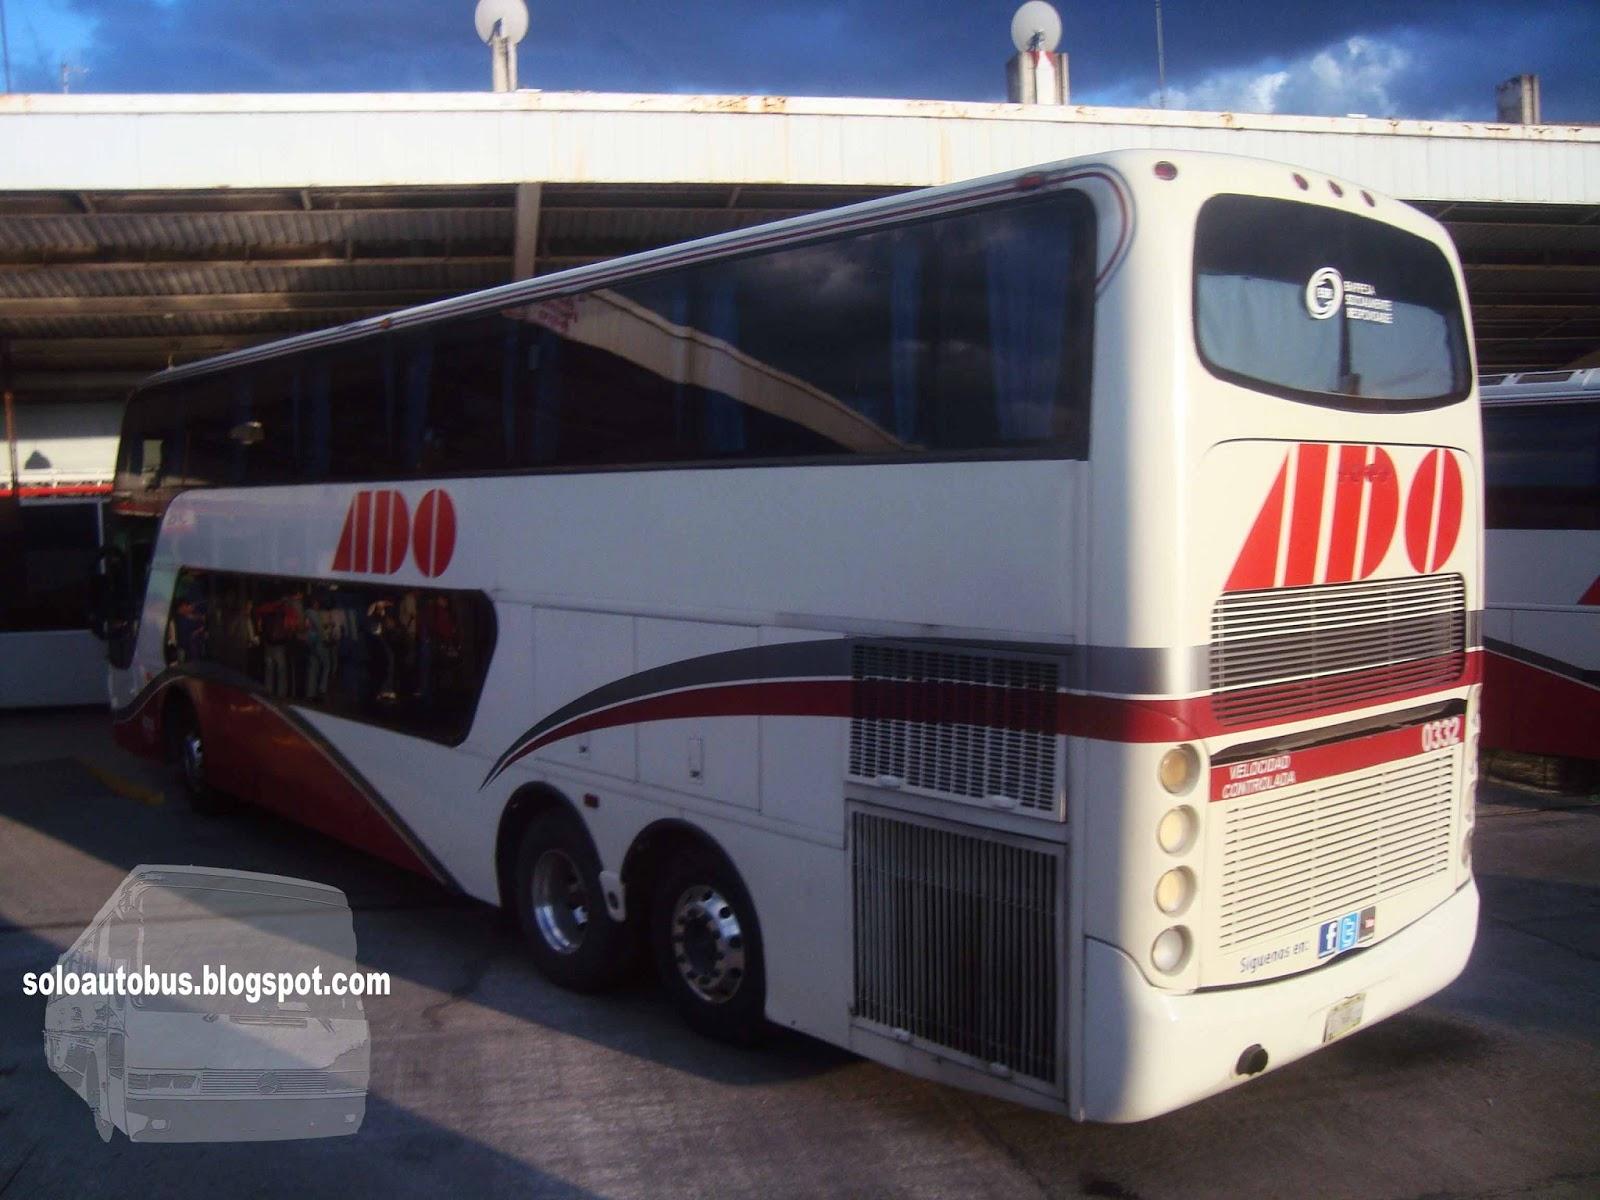 Soloautobus ado busscar panoramico dd - Autobuses de dos pisos ...